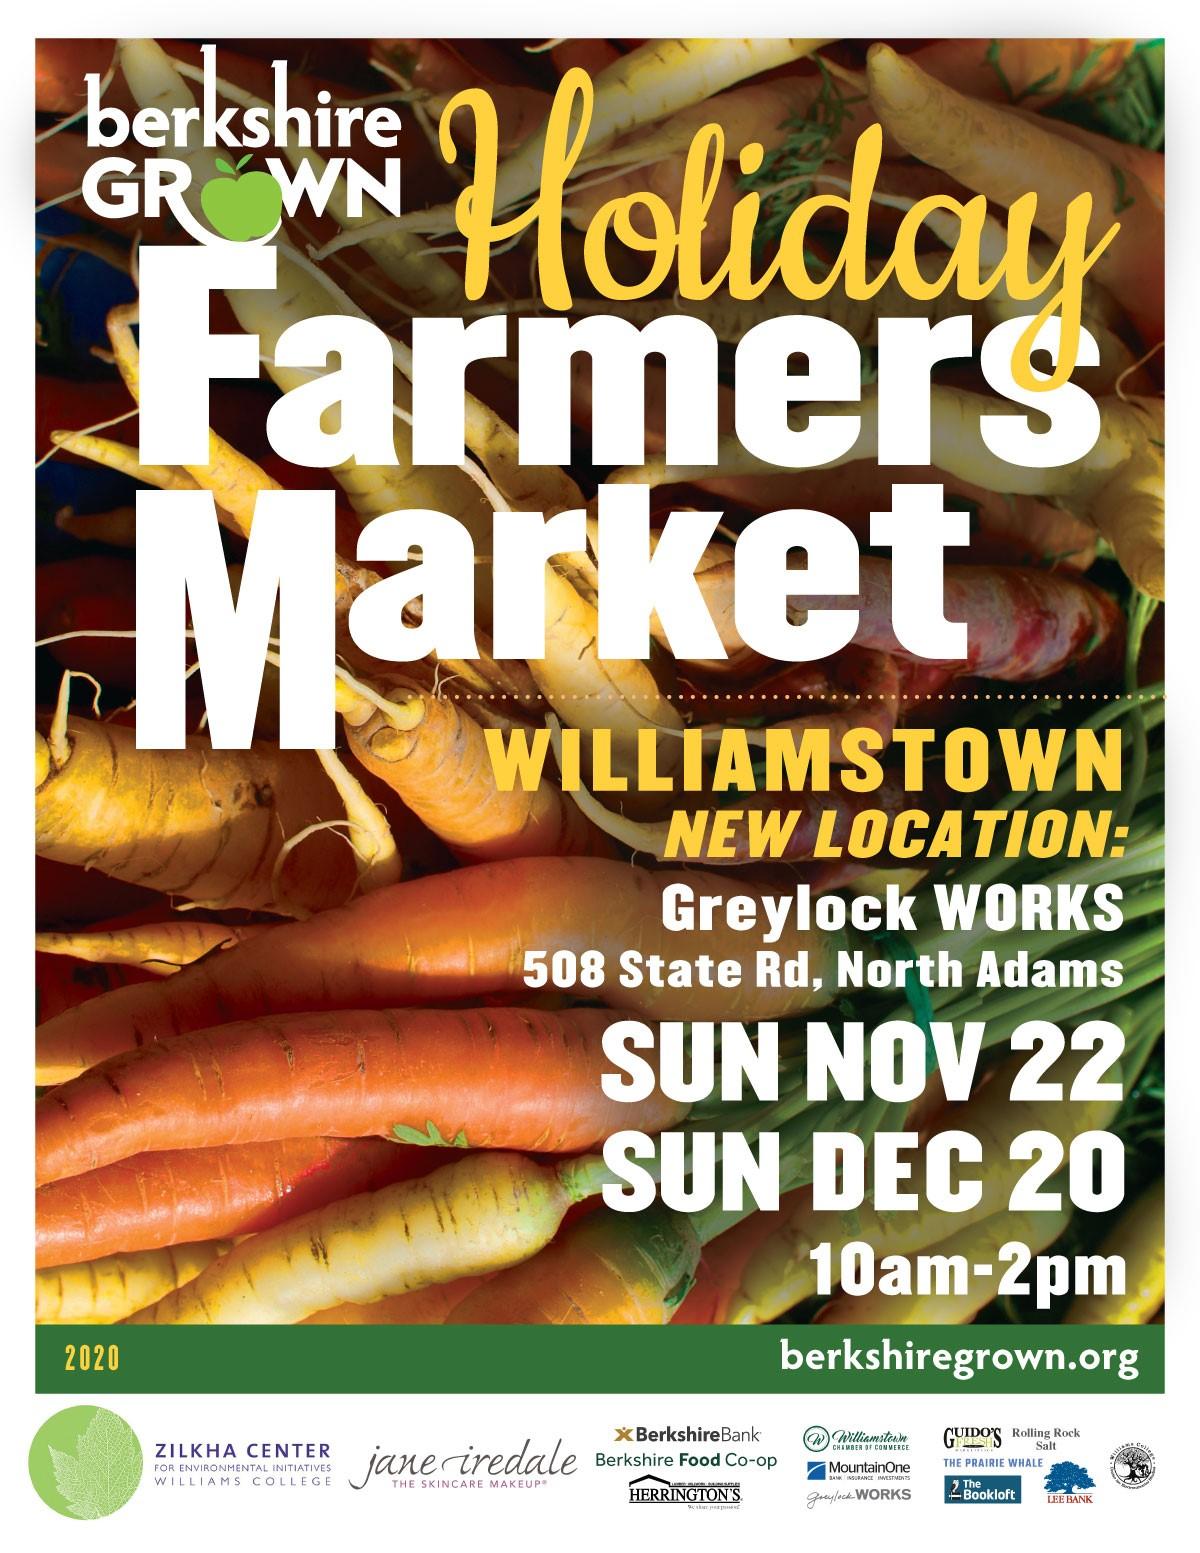 Berkshire Grown Williamstown Holiday Farmers Markets